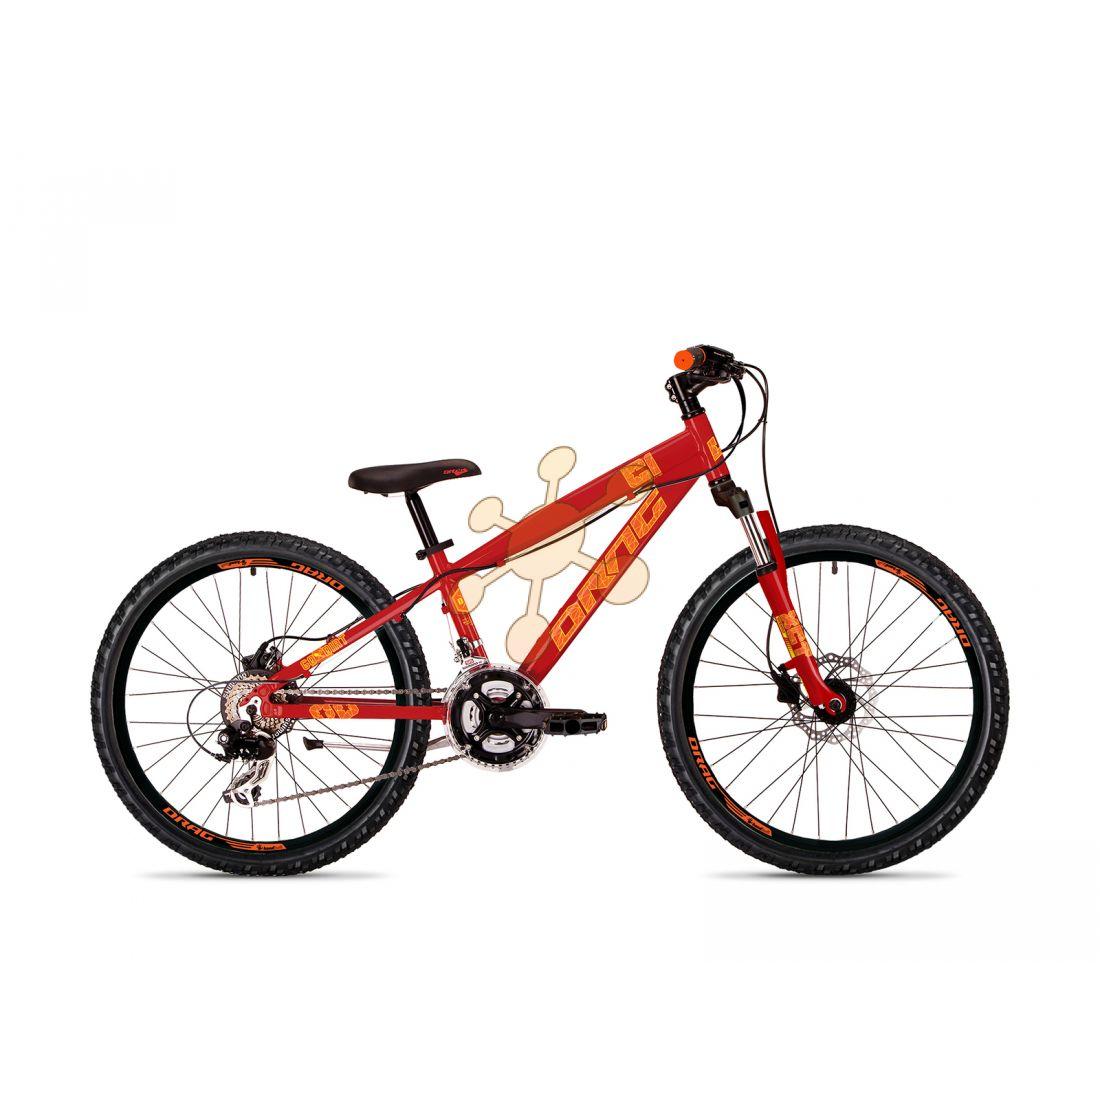 4dbc10ba262e dragbicykle.sk - Bicykle - Detské bicykle - Drag C 1 Te Detský bicykel